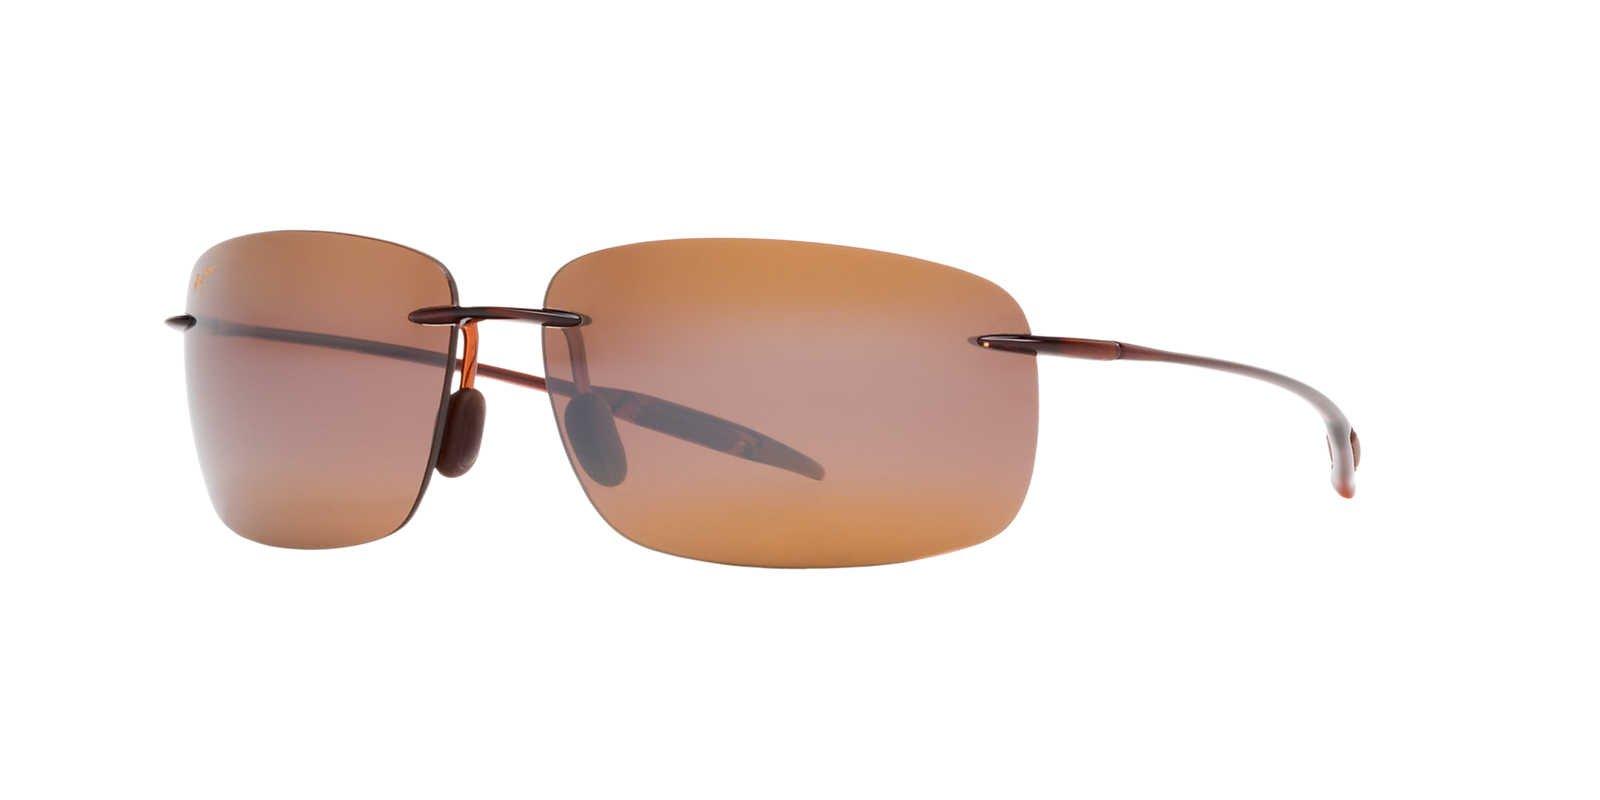 Maui Jim Mens Breakwall Sunglasses (422) Brown/Bronze Plastic,Acetate - Polarized - 63mm by Maui Jim